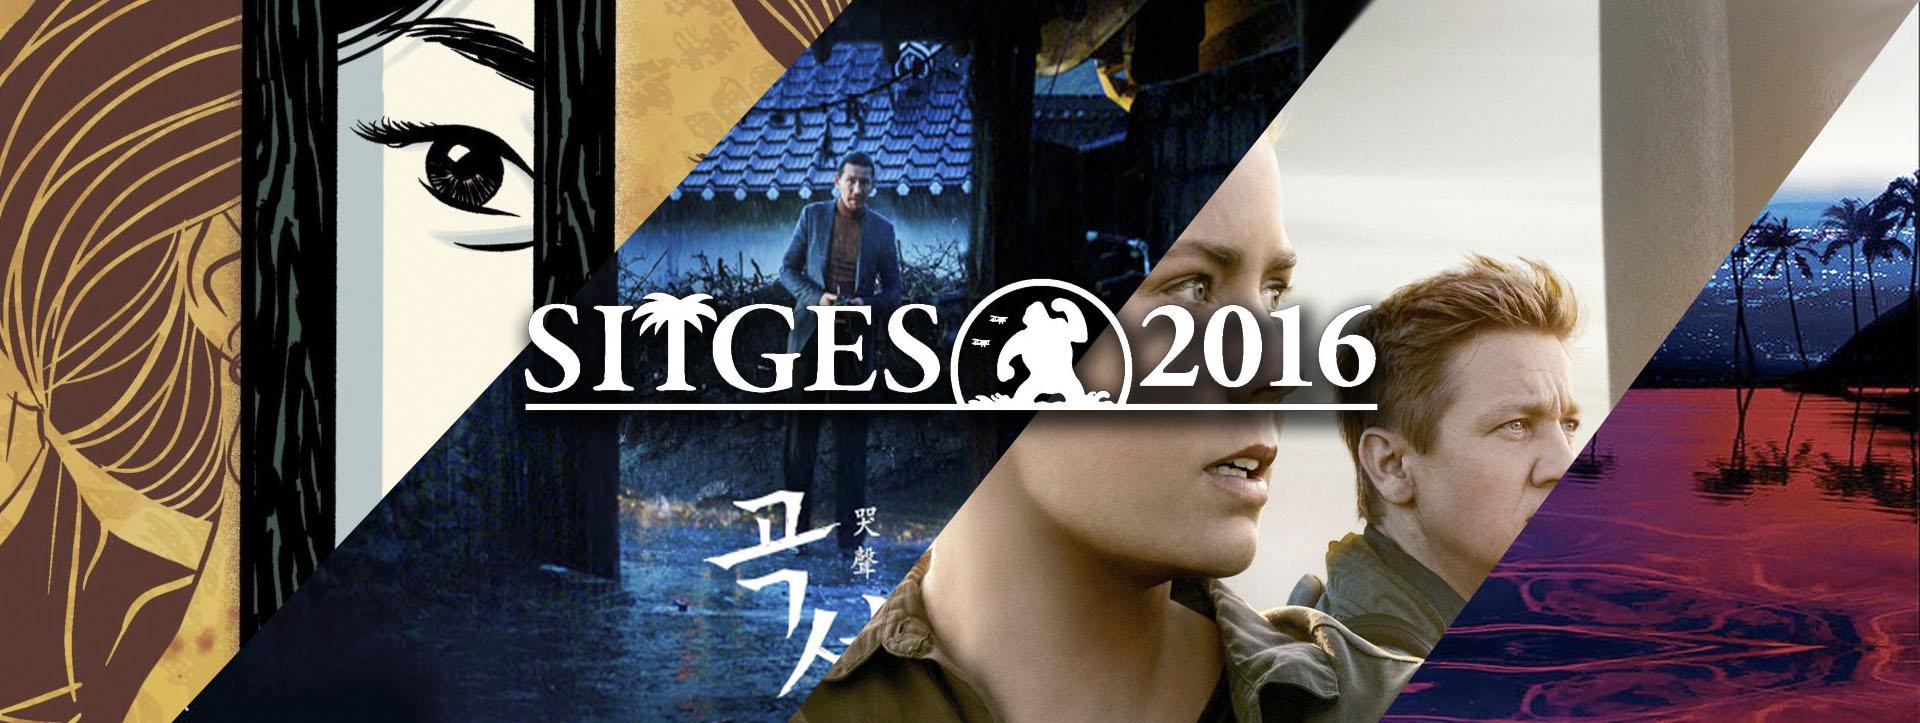 sitges2016